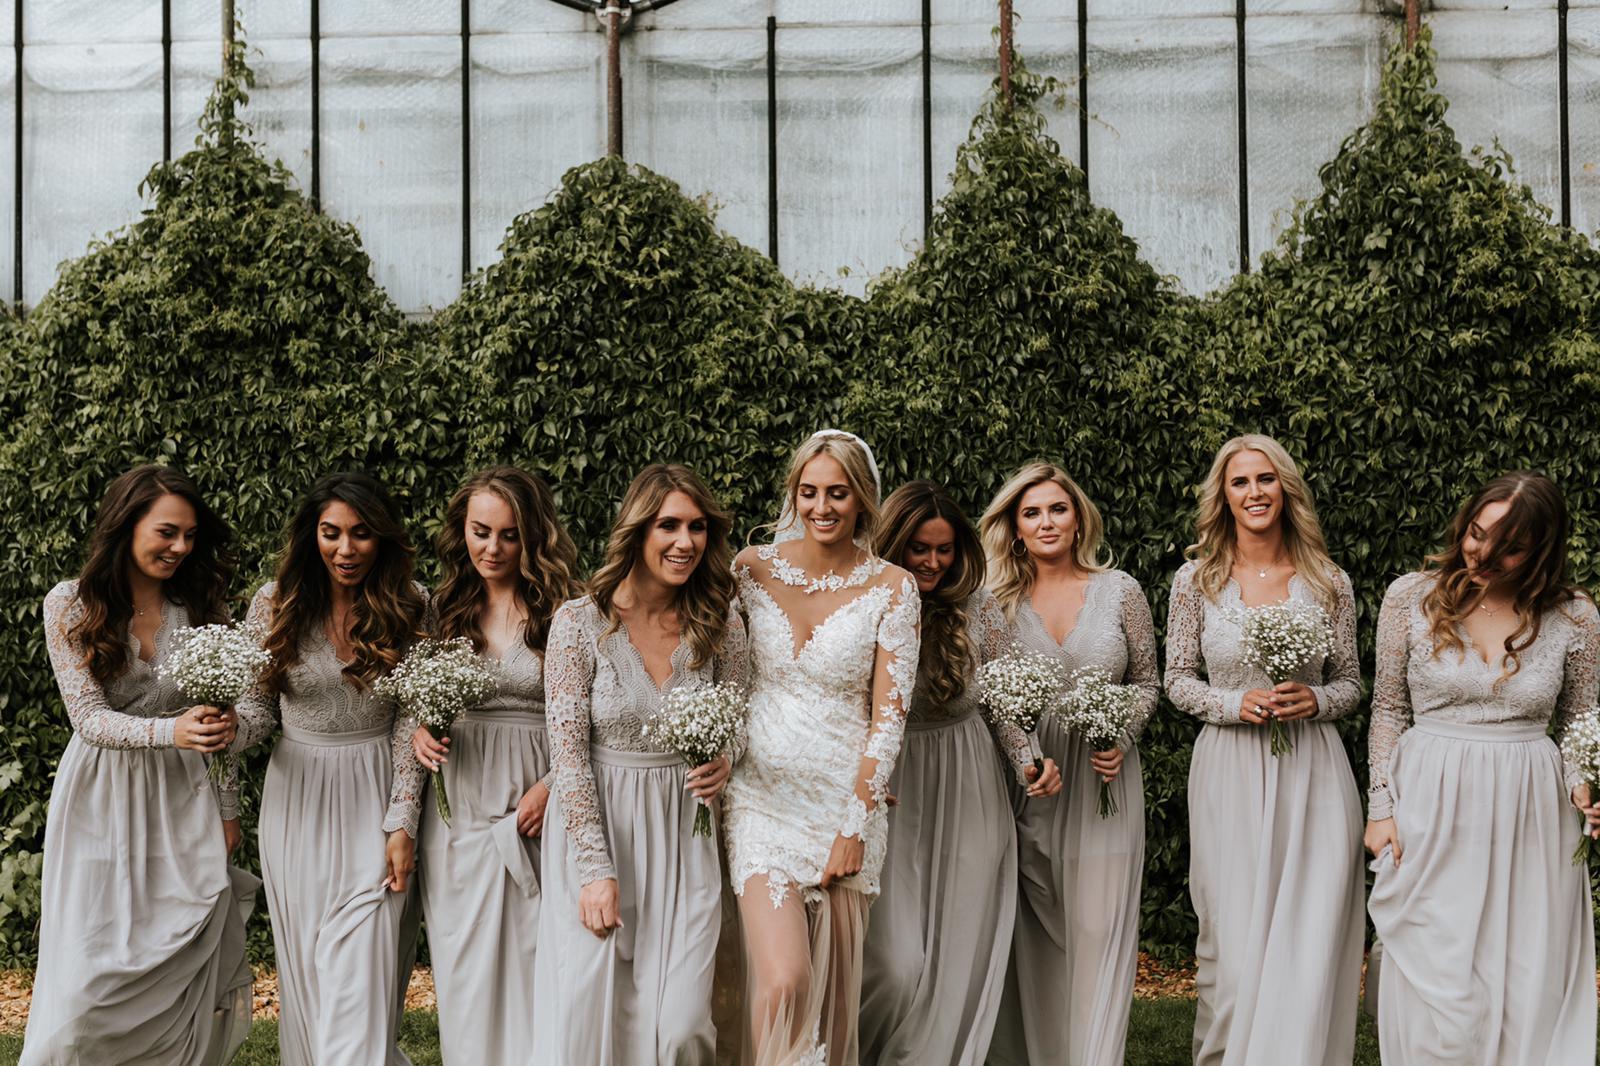 #apbloem #florist #bloemist #amsterdam #bridesmaids #bloemenwinkel #kerkstraat #bloemen #flowers #weddingstyling #bruiloft #trouwen #liefde #bride #wedding #marriage #bruidsboeket #floraldesign #mordernwedding #modernbride #greenhouse #kas #planten #styling #interiorstyling #white #wit